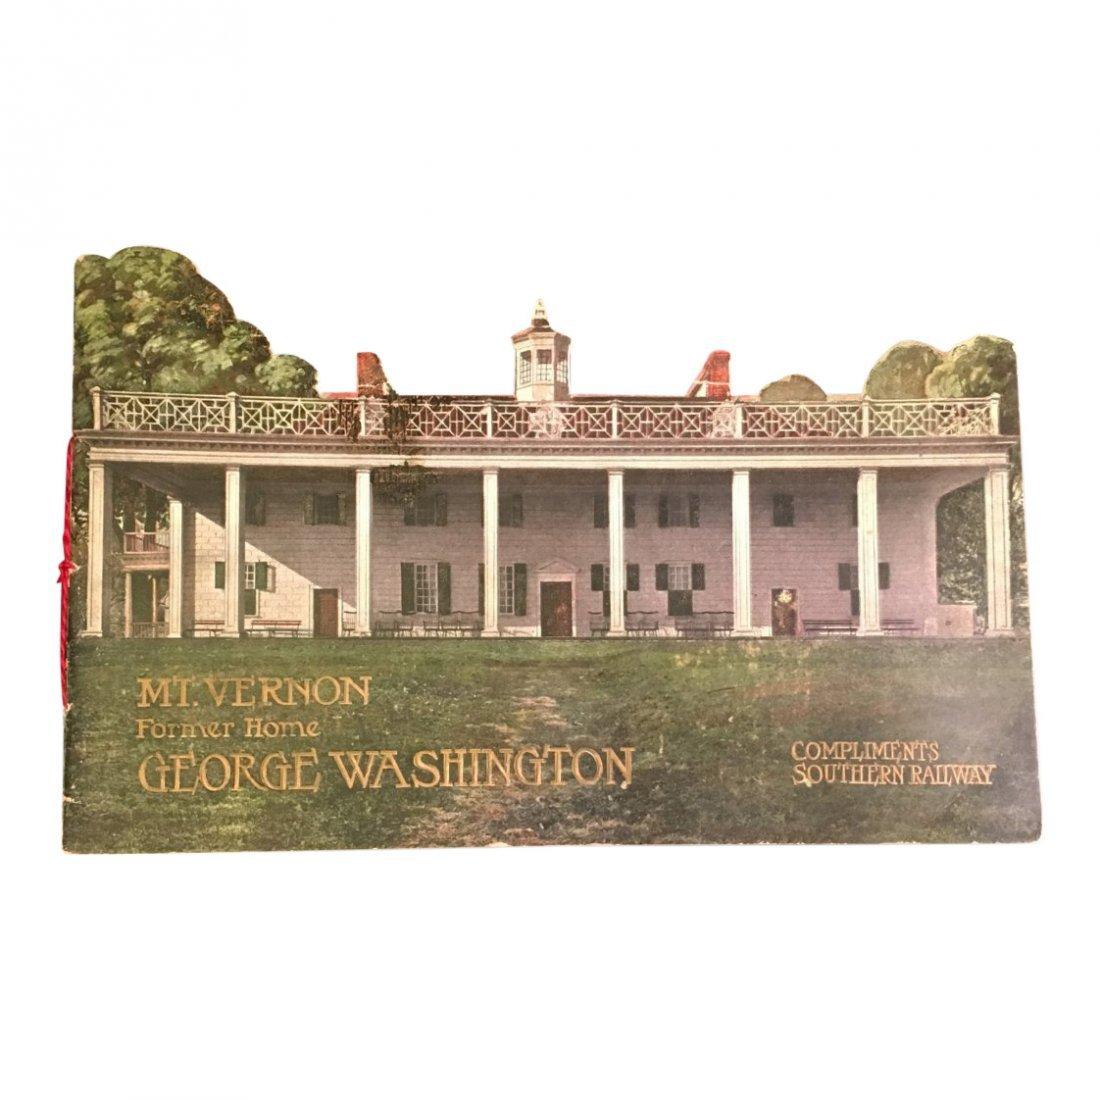 Mount Vernon: Former Home of George Washington, 1906